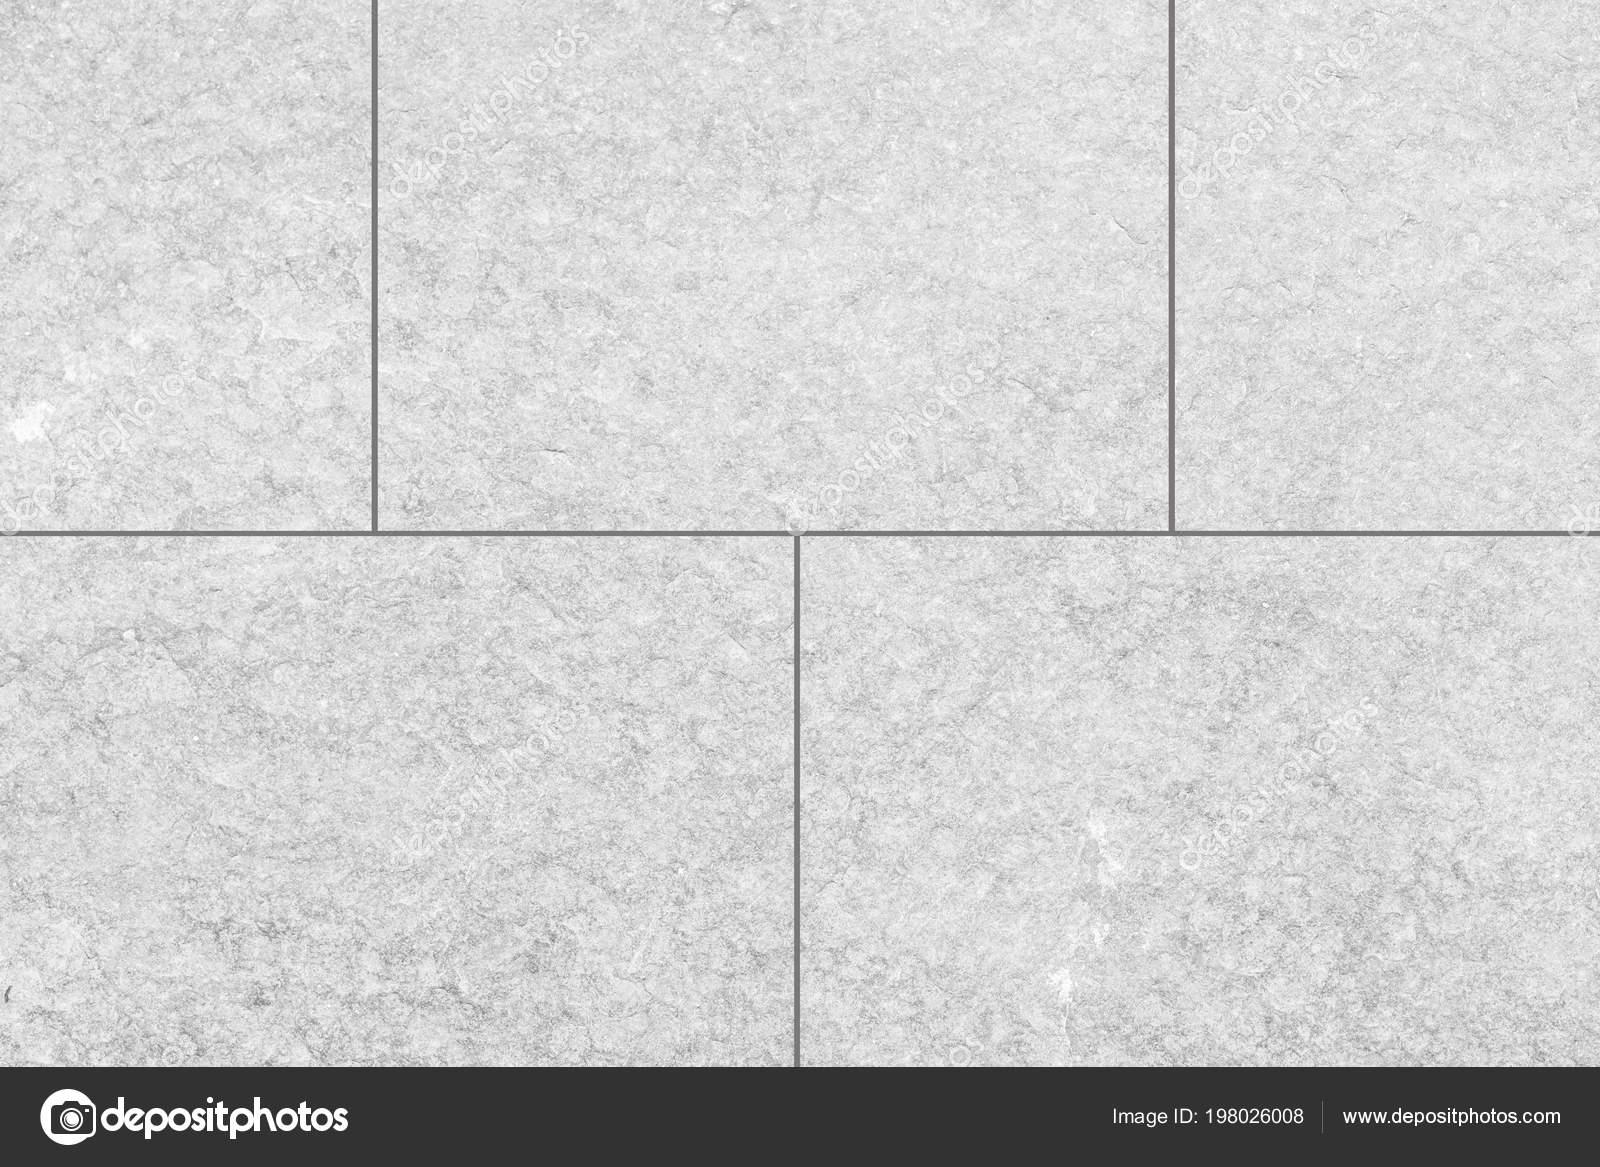 https depositphotos com 198026008 stock photo outdoor white stone tile floor html